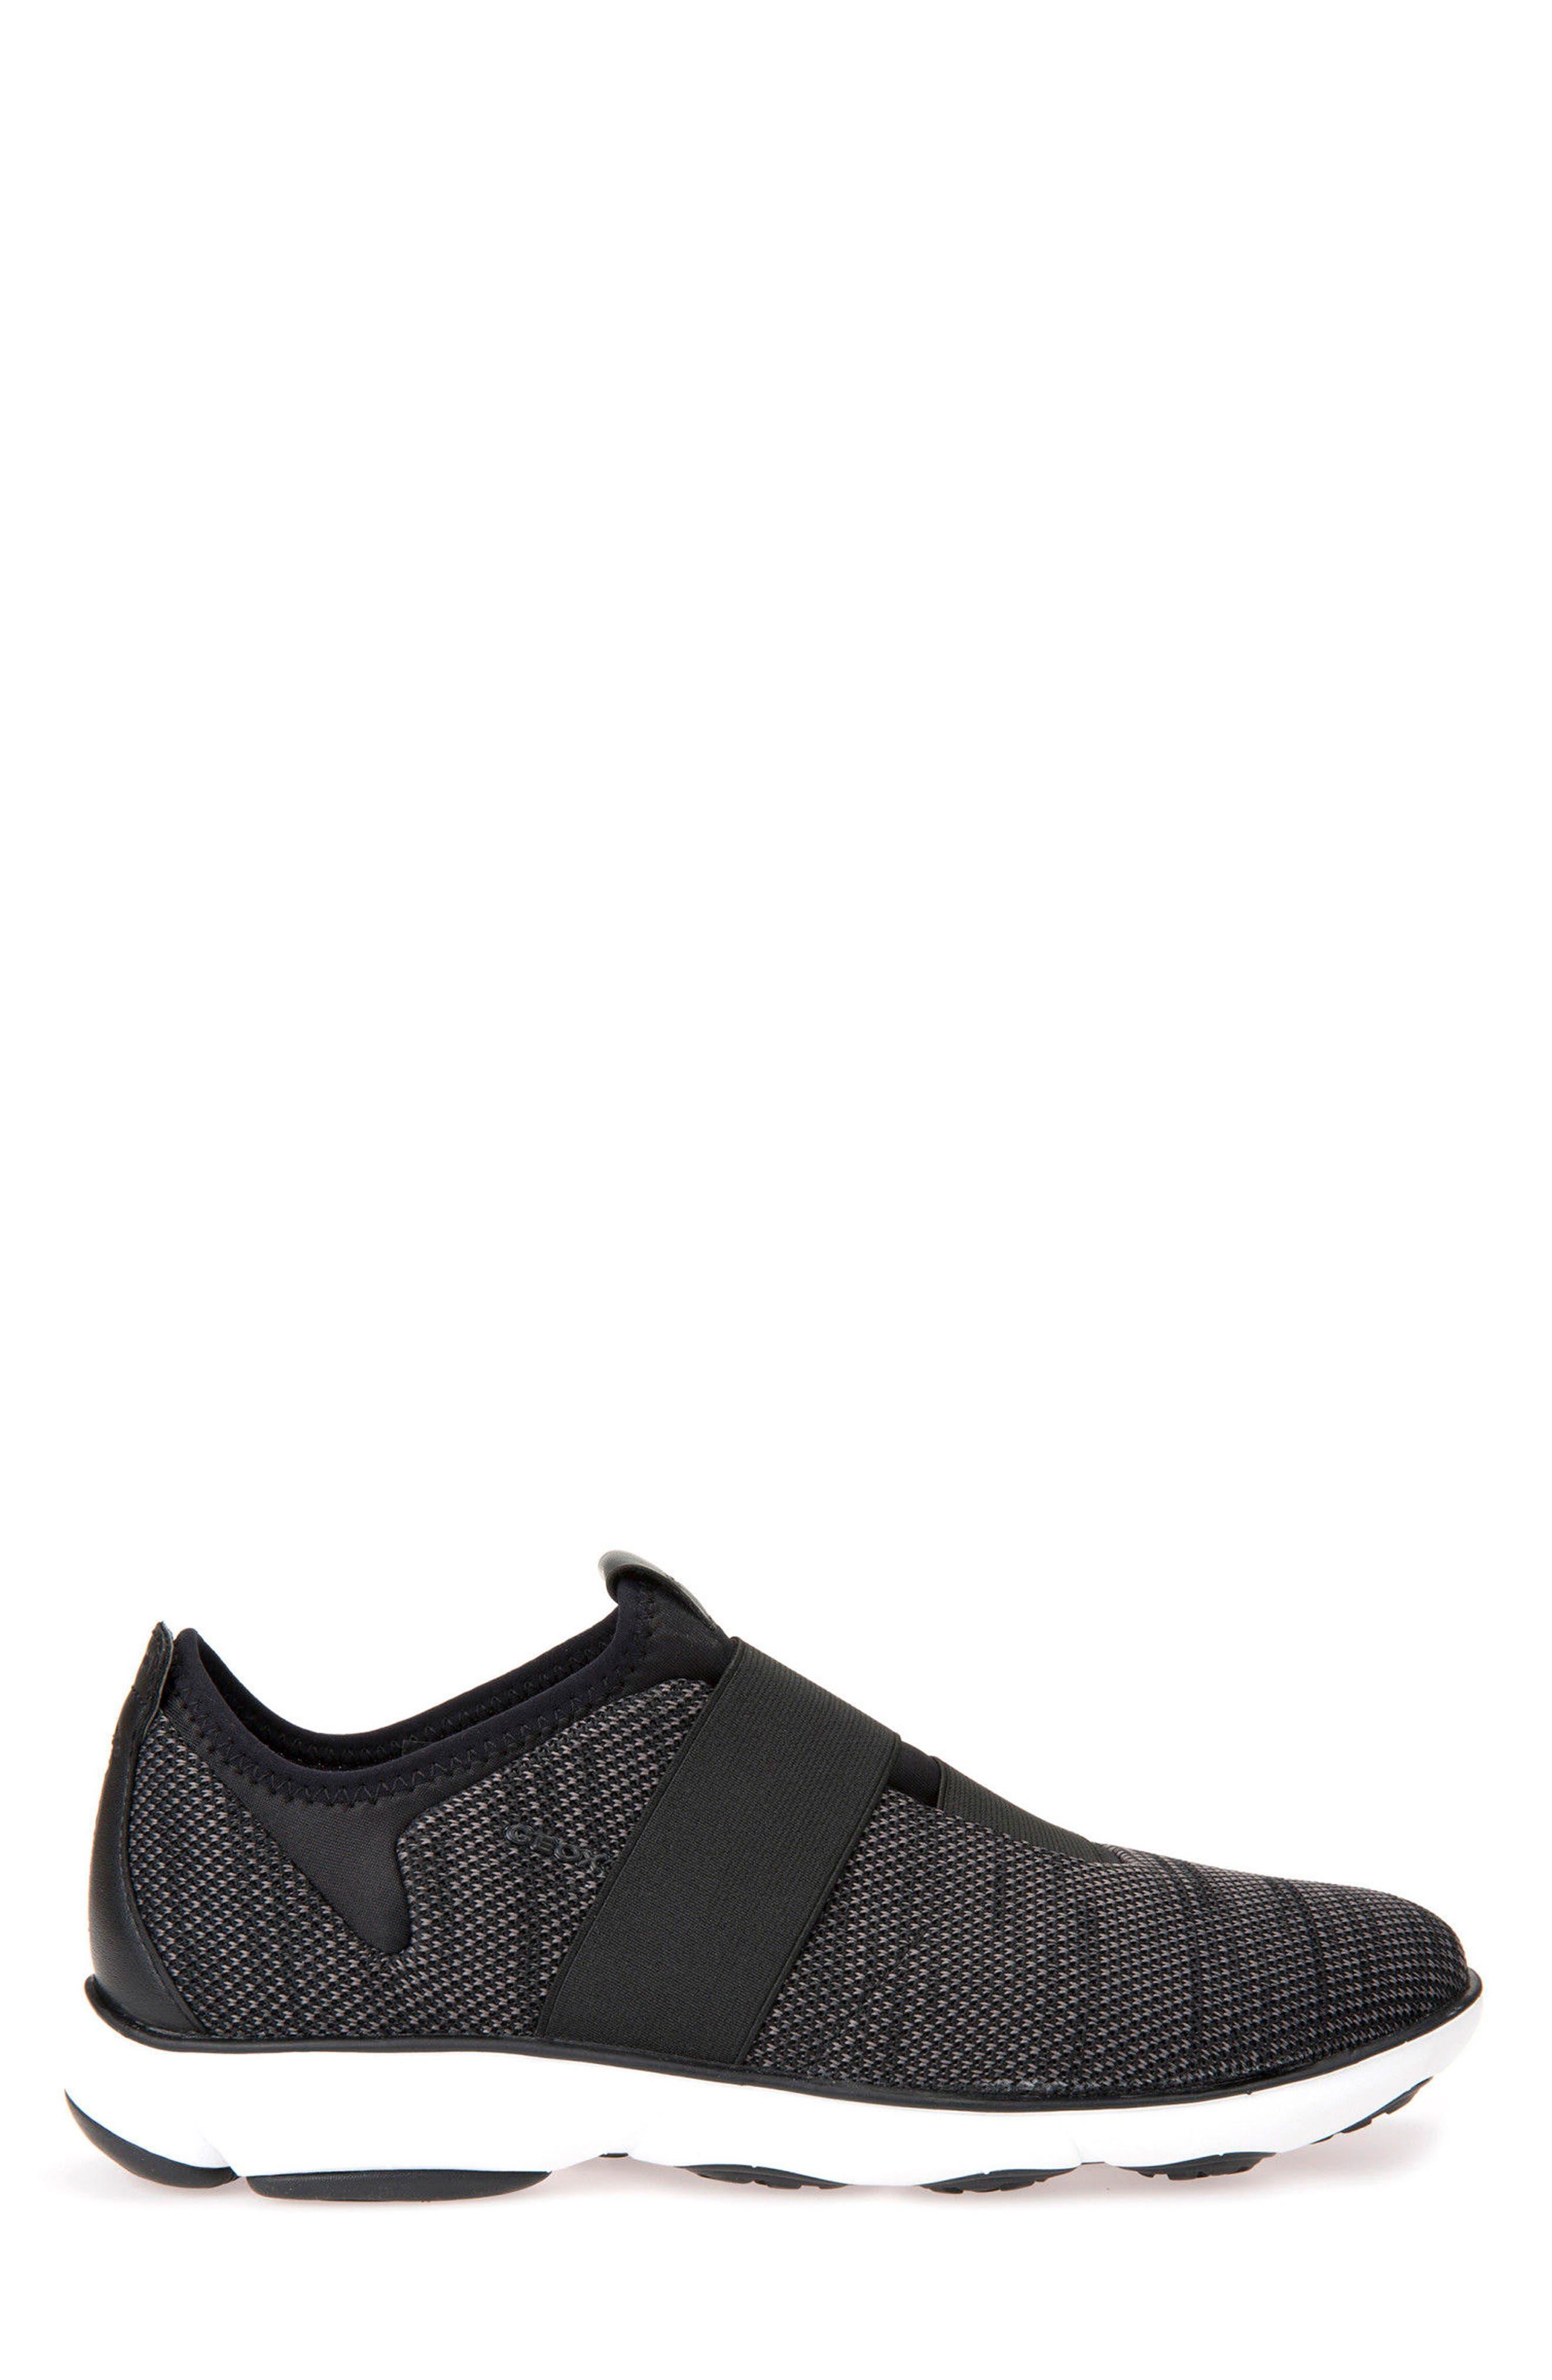 GEOX, Nebula 45 Banded Slip-On Sneaker, Main thumbnail 1, color, BLACK